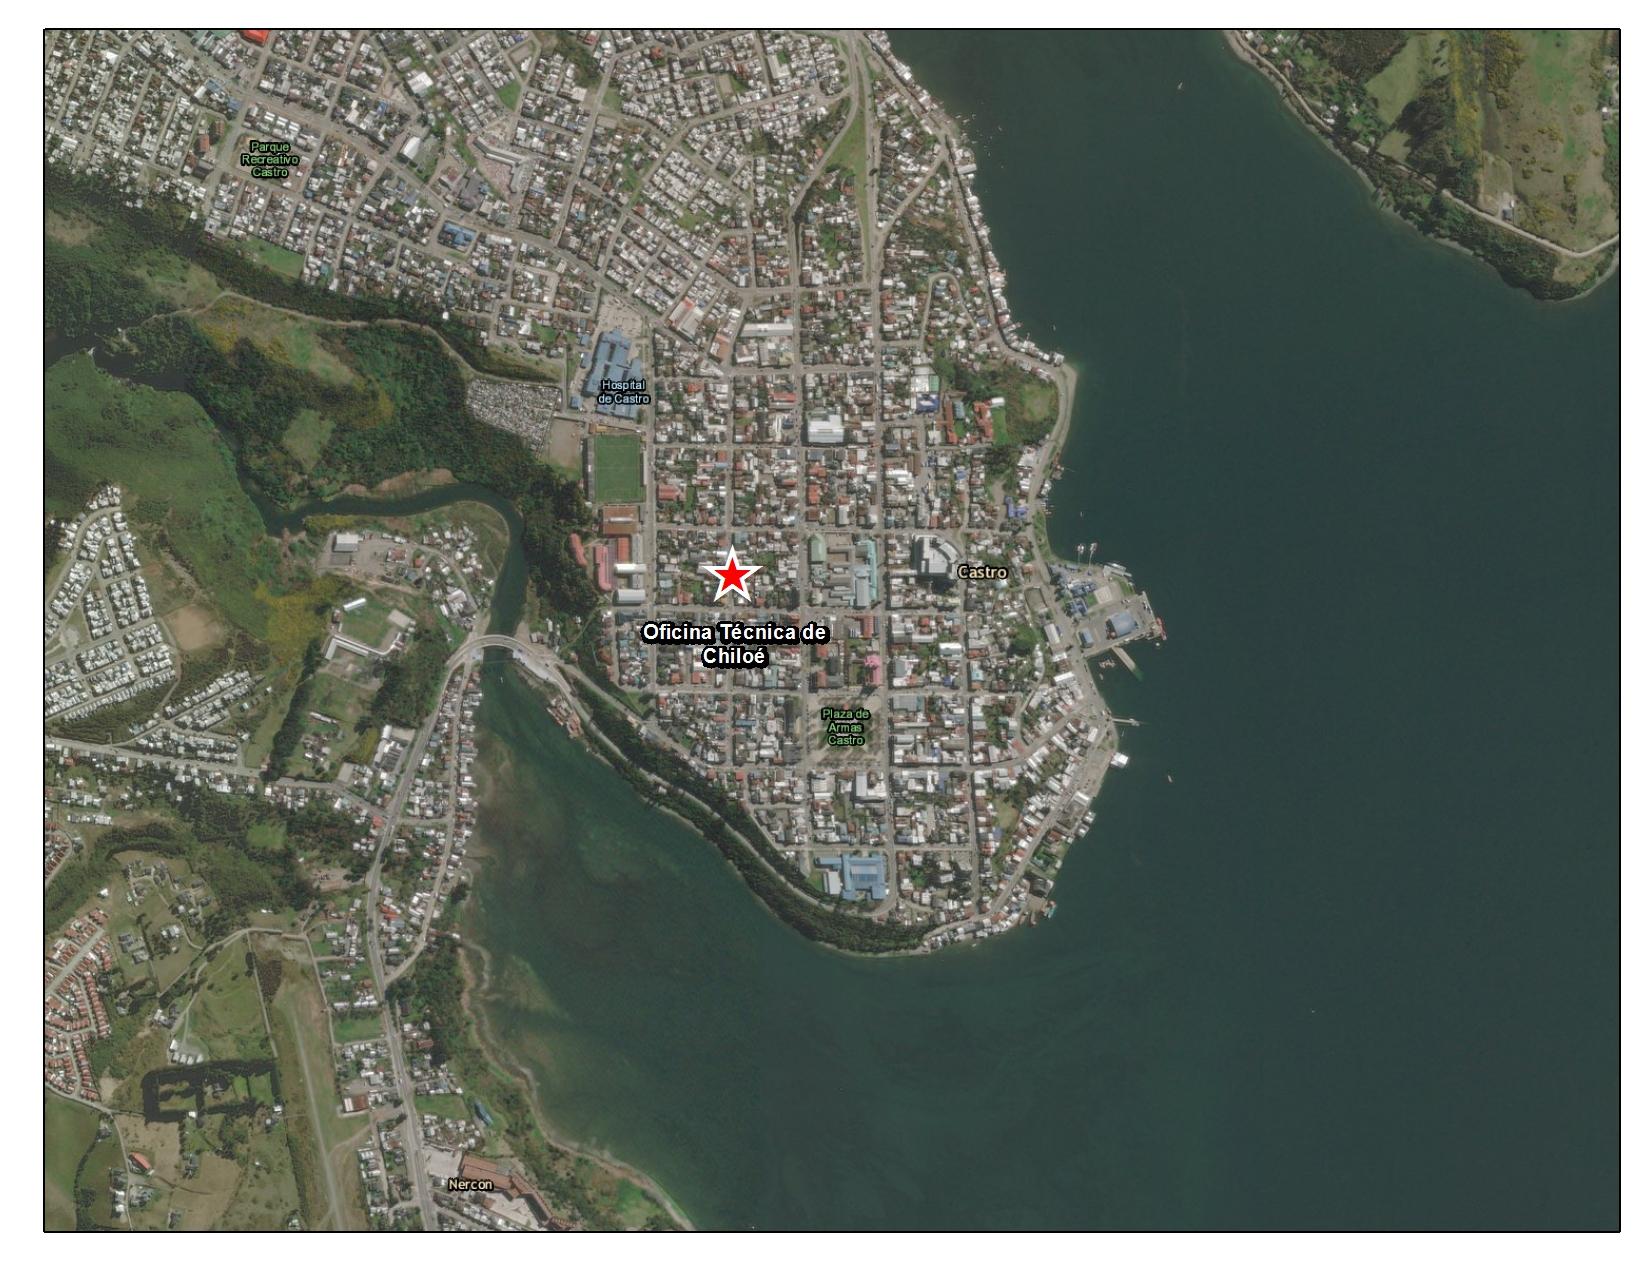 Imagen de Oficina técnica Provincial de Chiloé